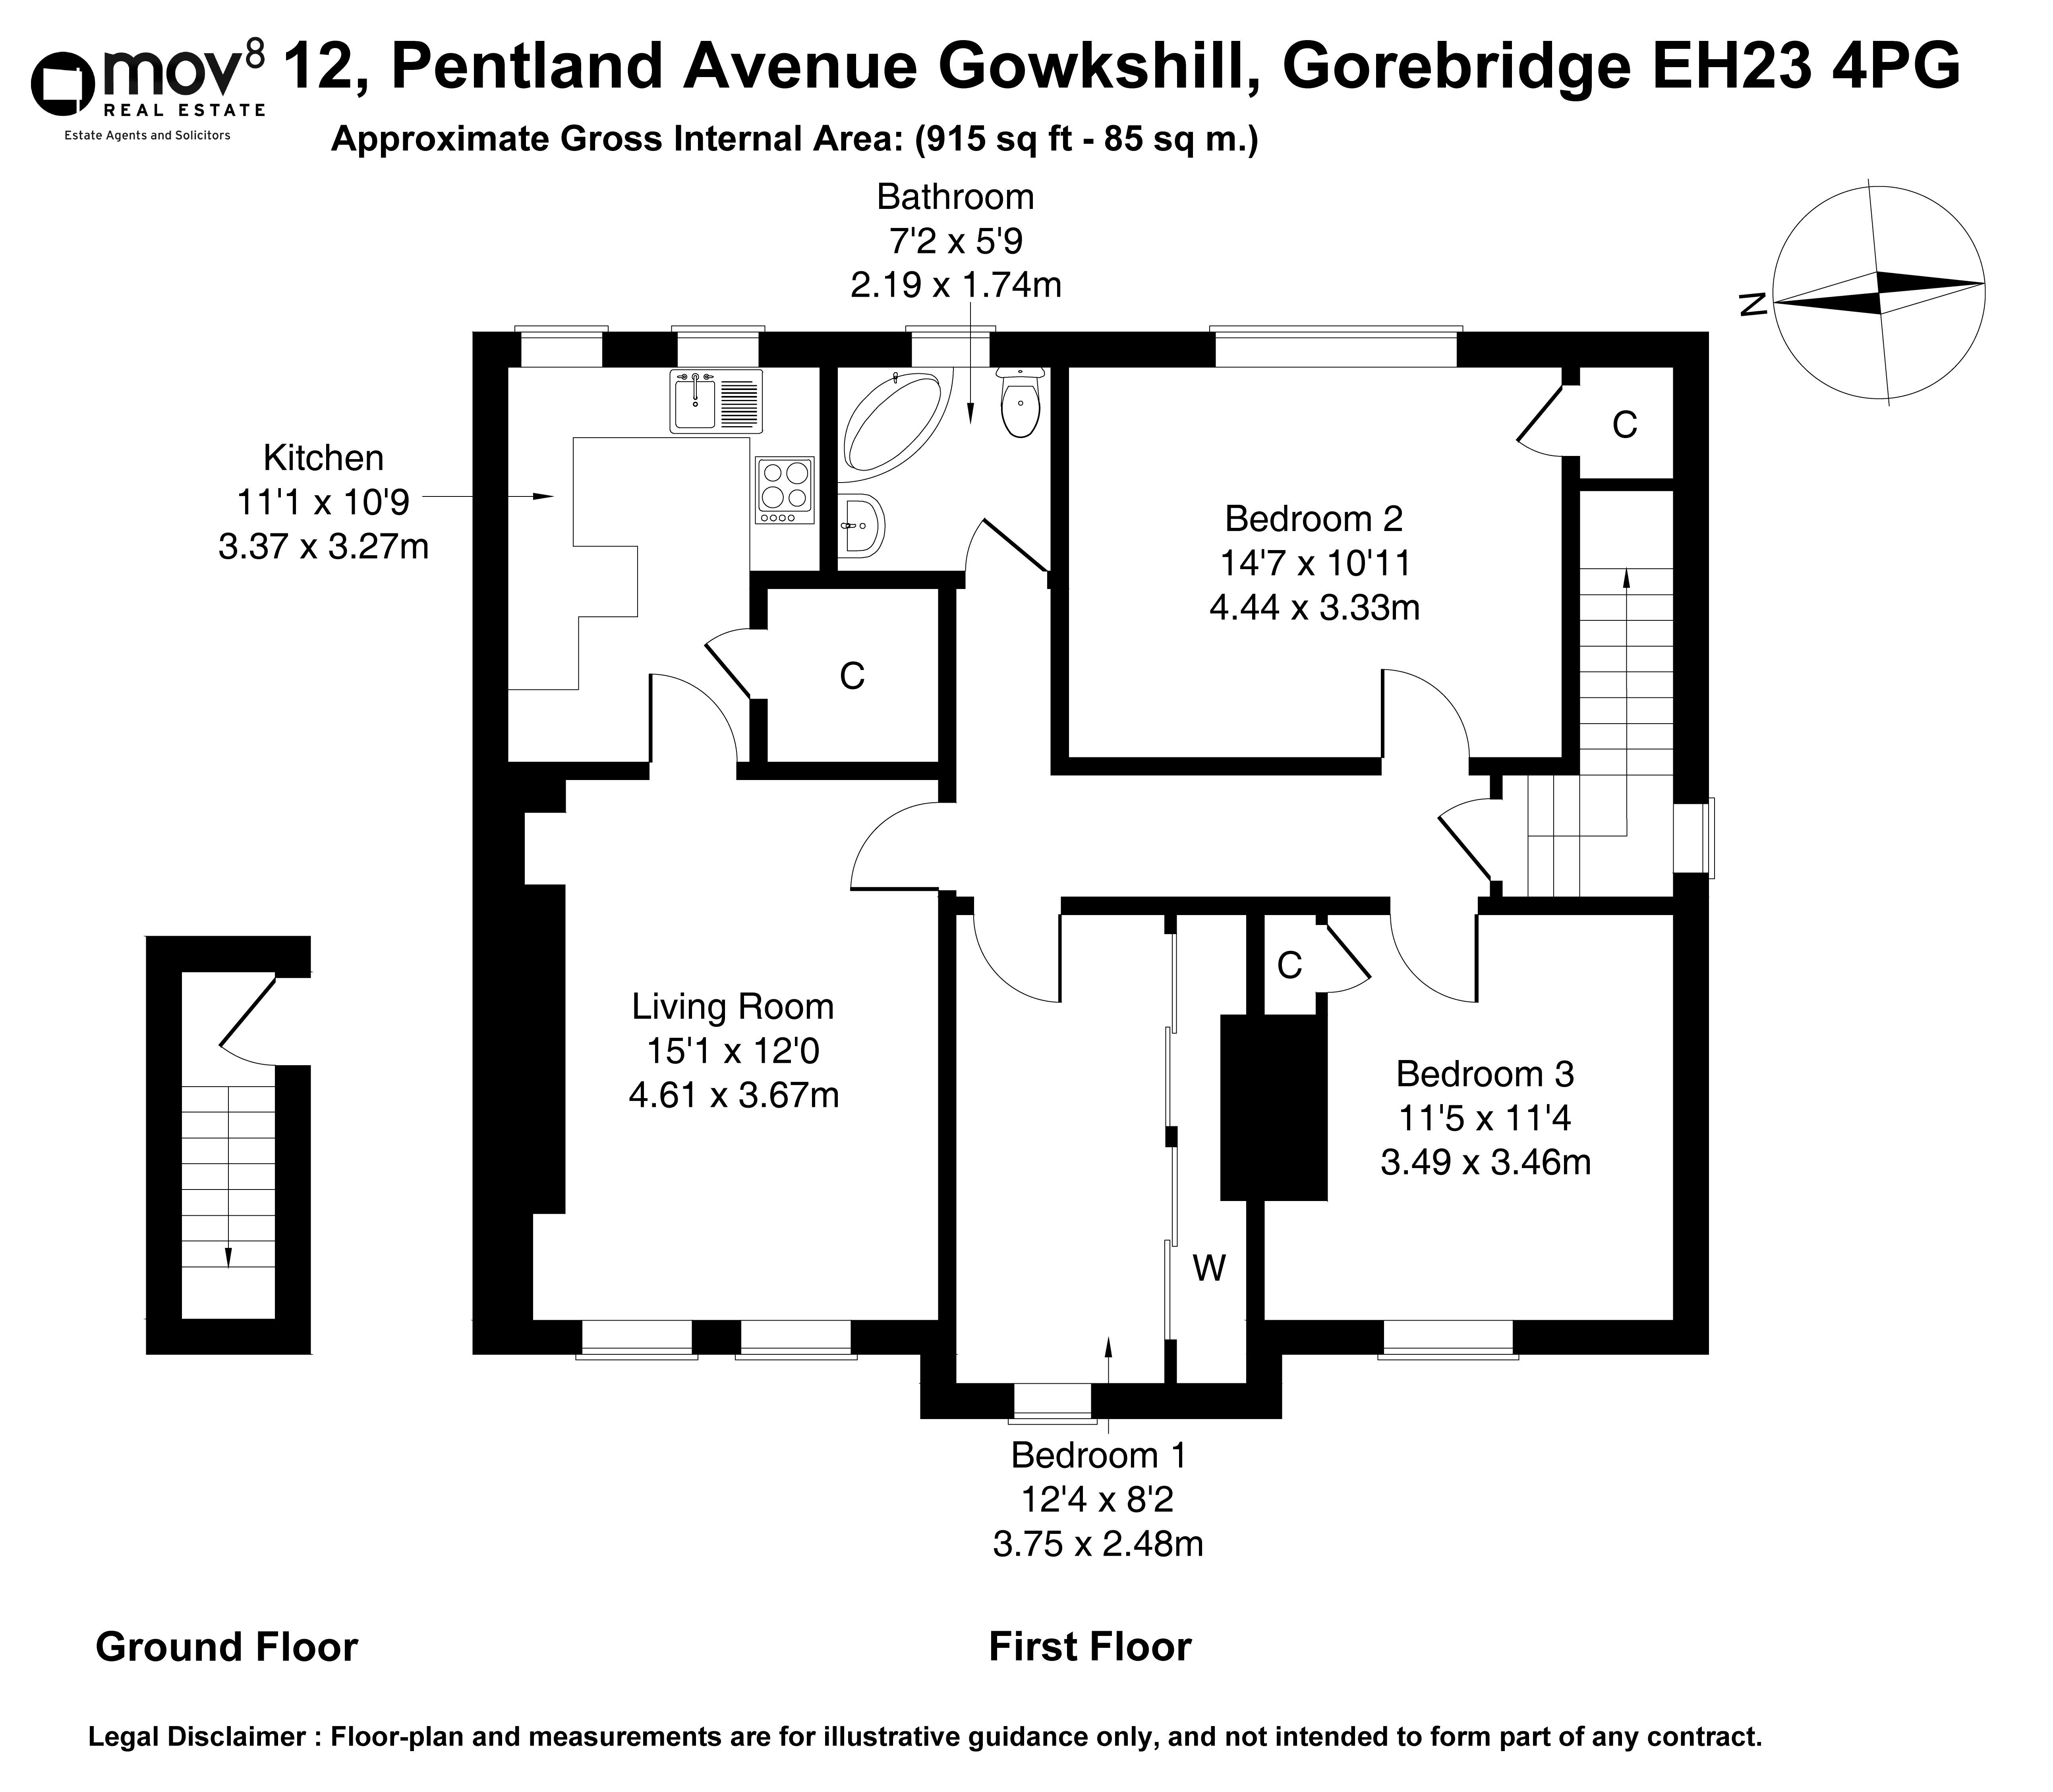 Floorplan 1 of 12 Pentland Avenue, Gowkshill, Gorebridge, Midlothian, EH23 4PG